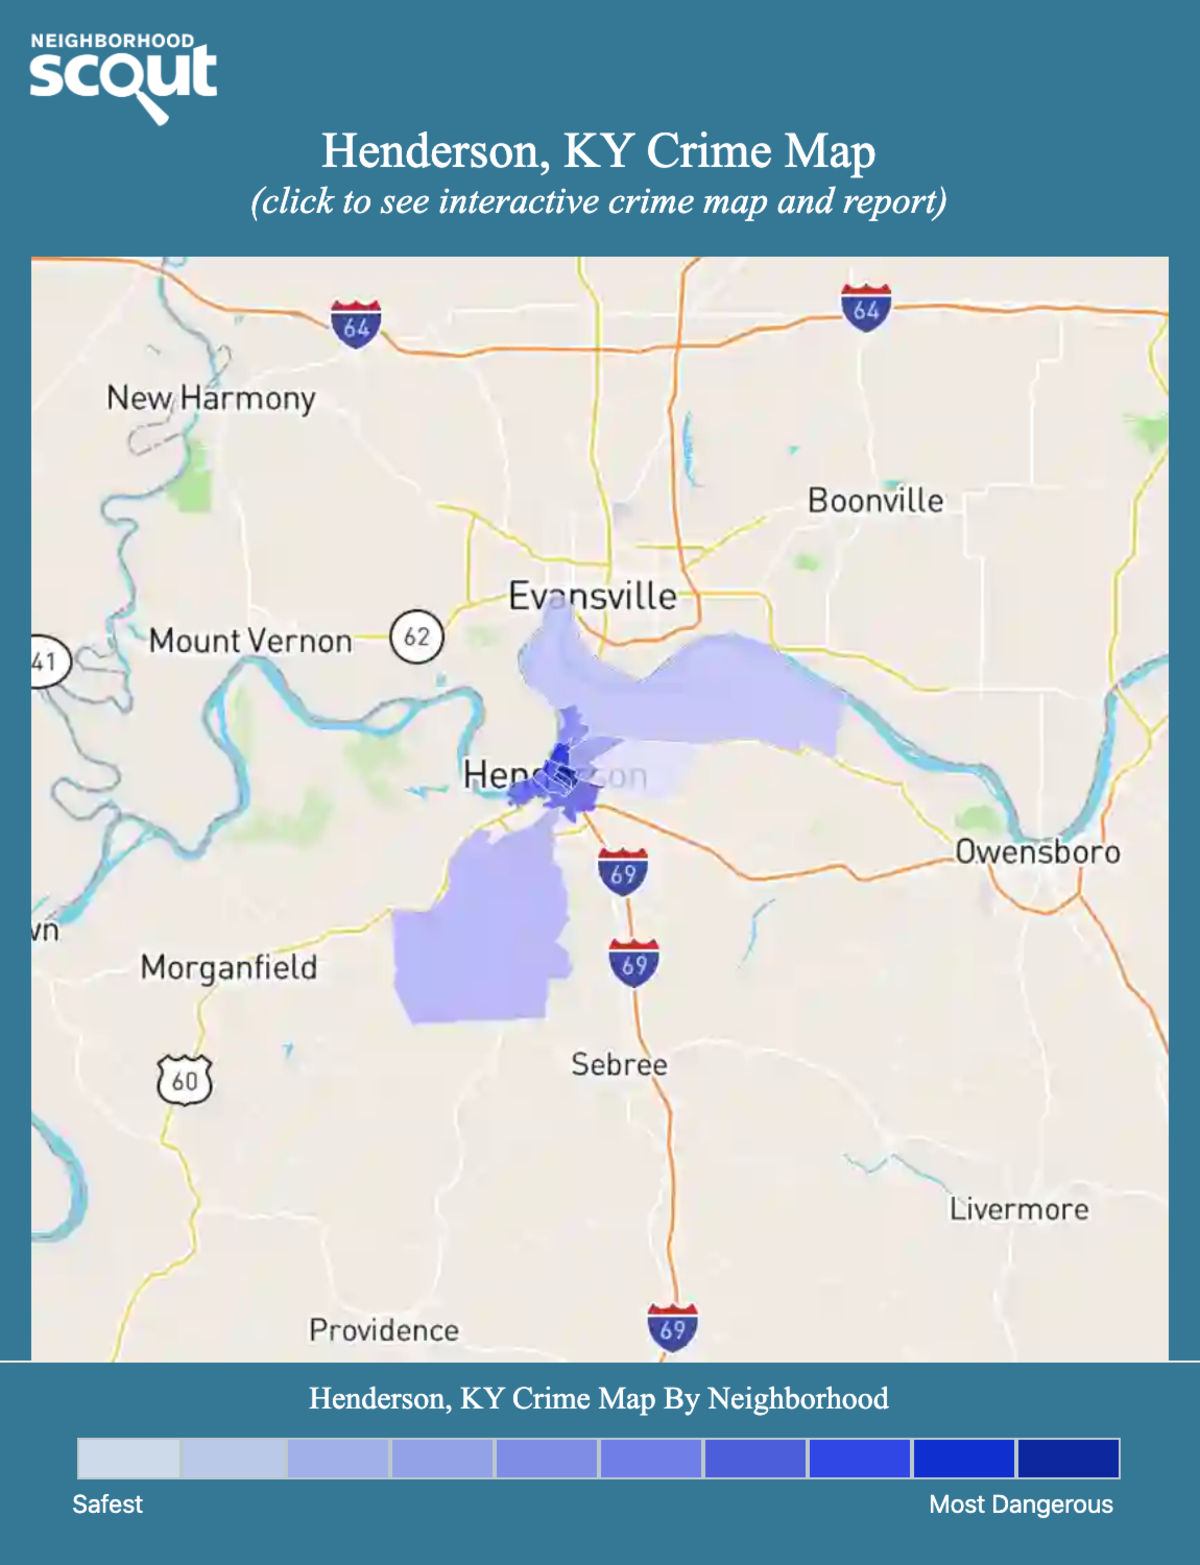 Henderson, Kentucky crime map